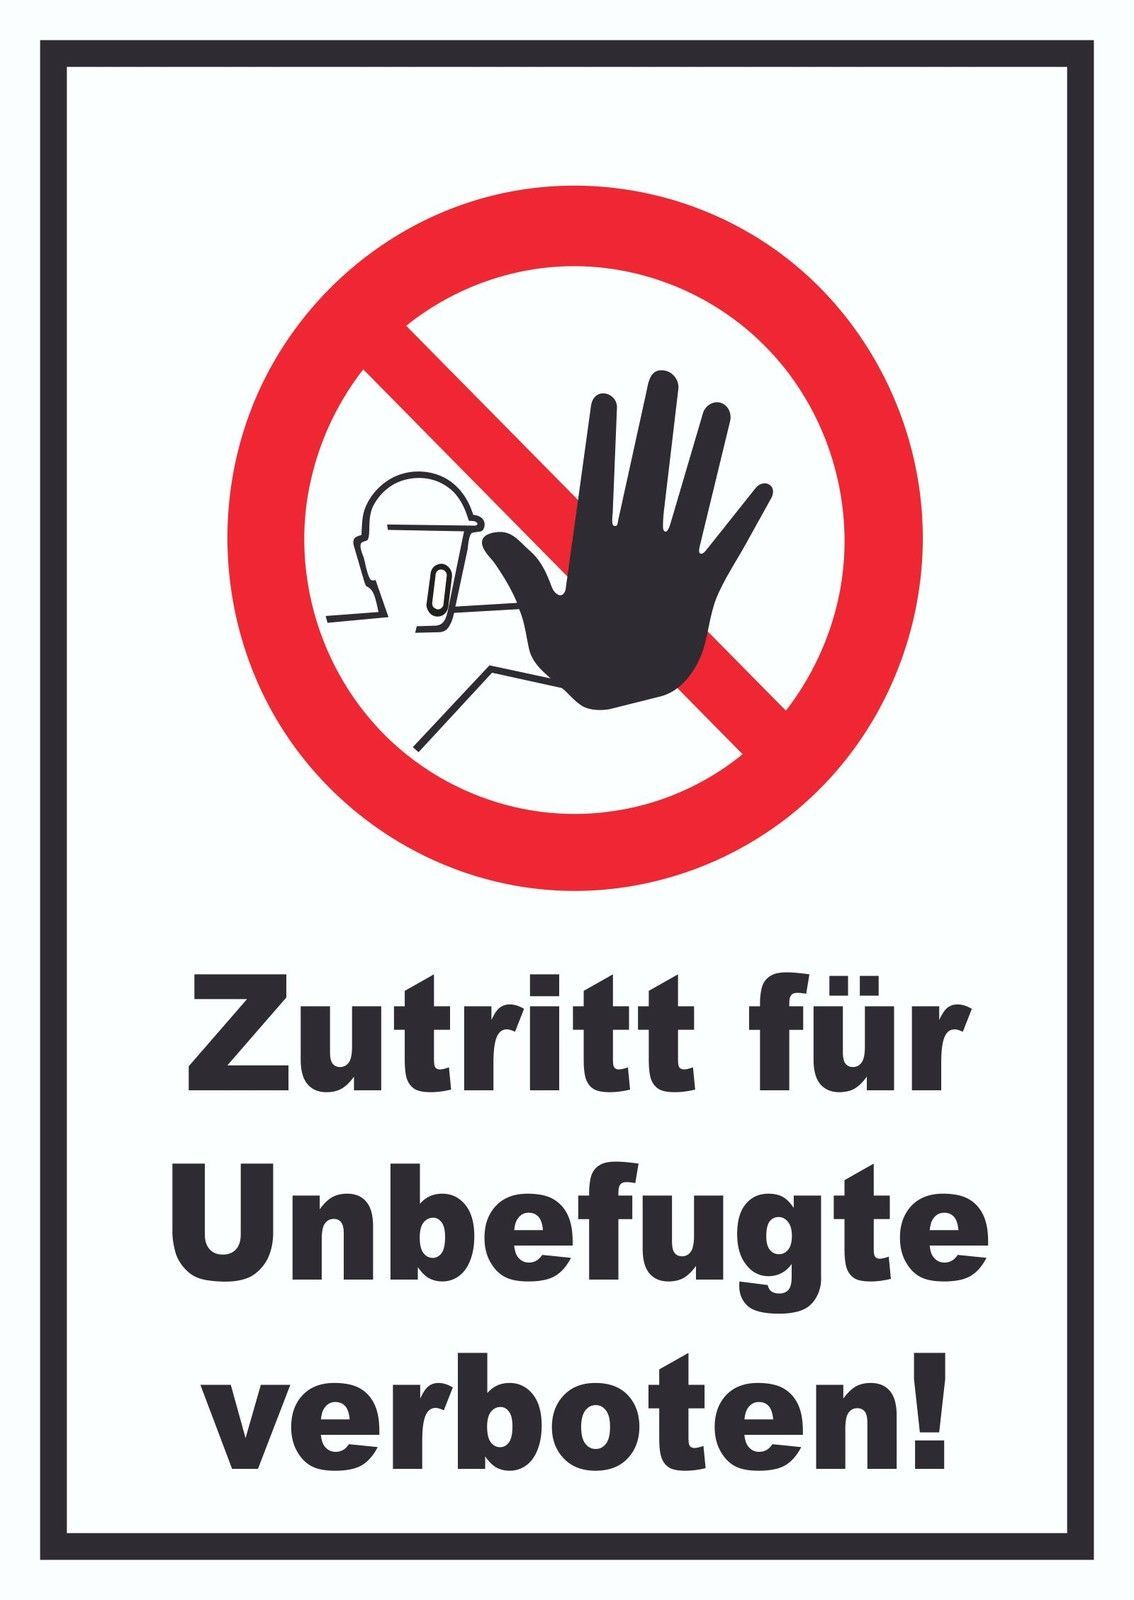 verbotsschild zutritt f r unbefugte verboten verbot schilder zutritt zugang schilder f r. Black Bedroom Furniture Sets. Home Design Ideas